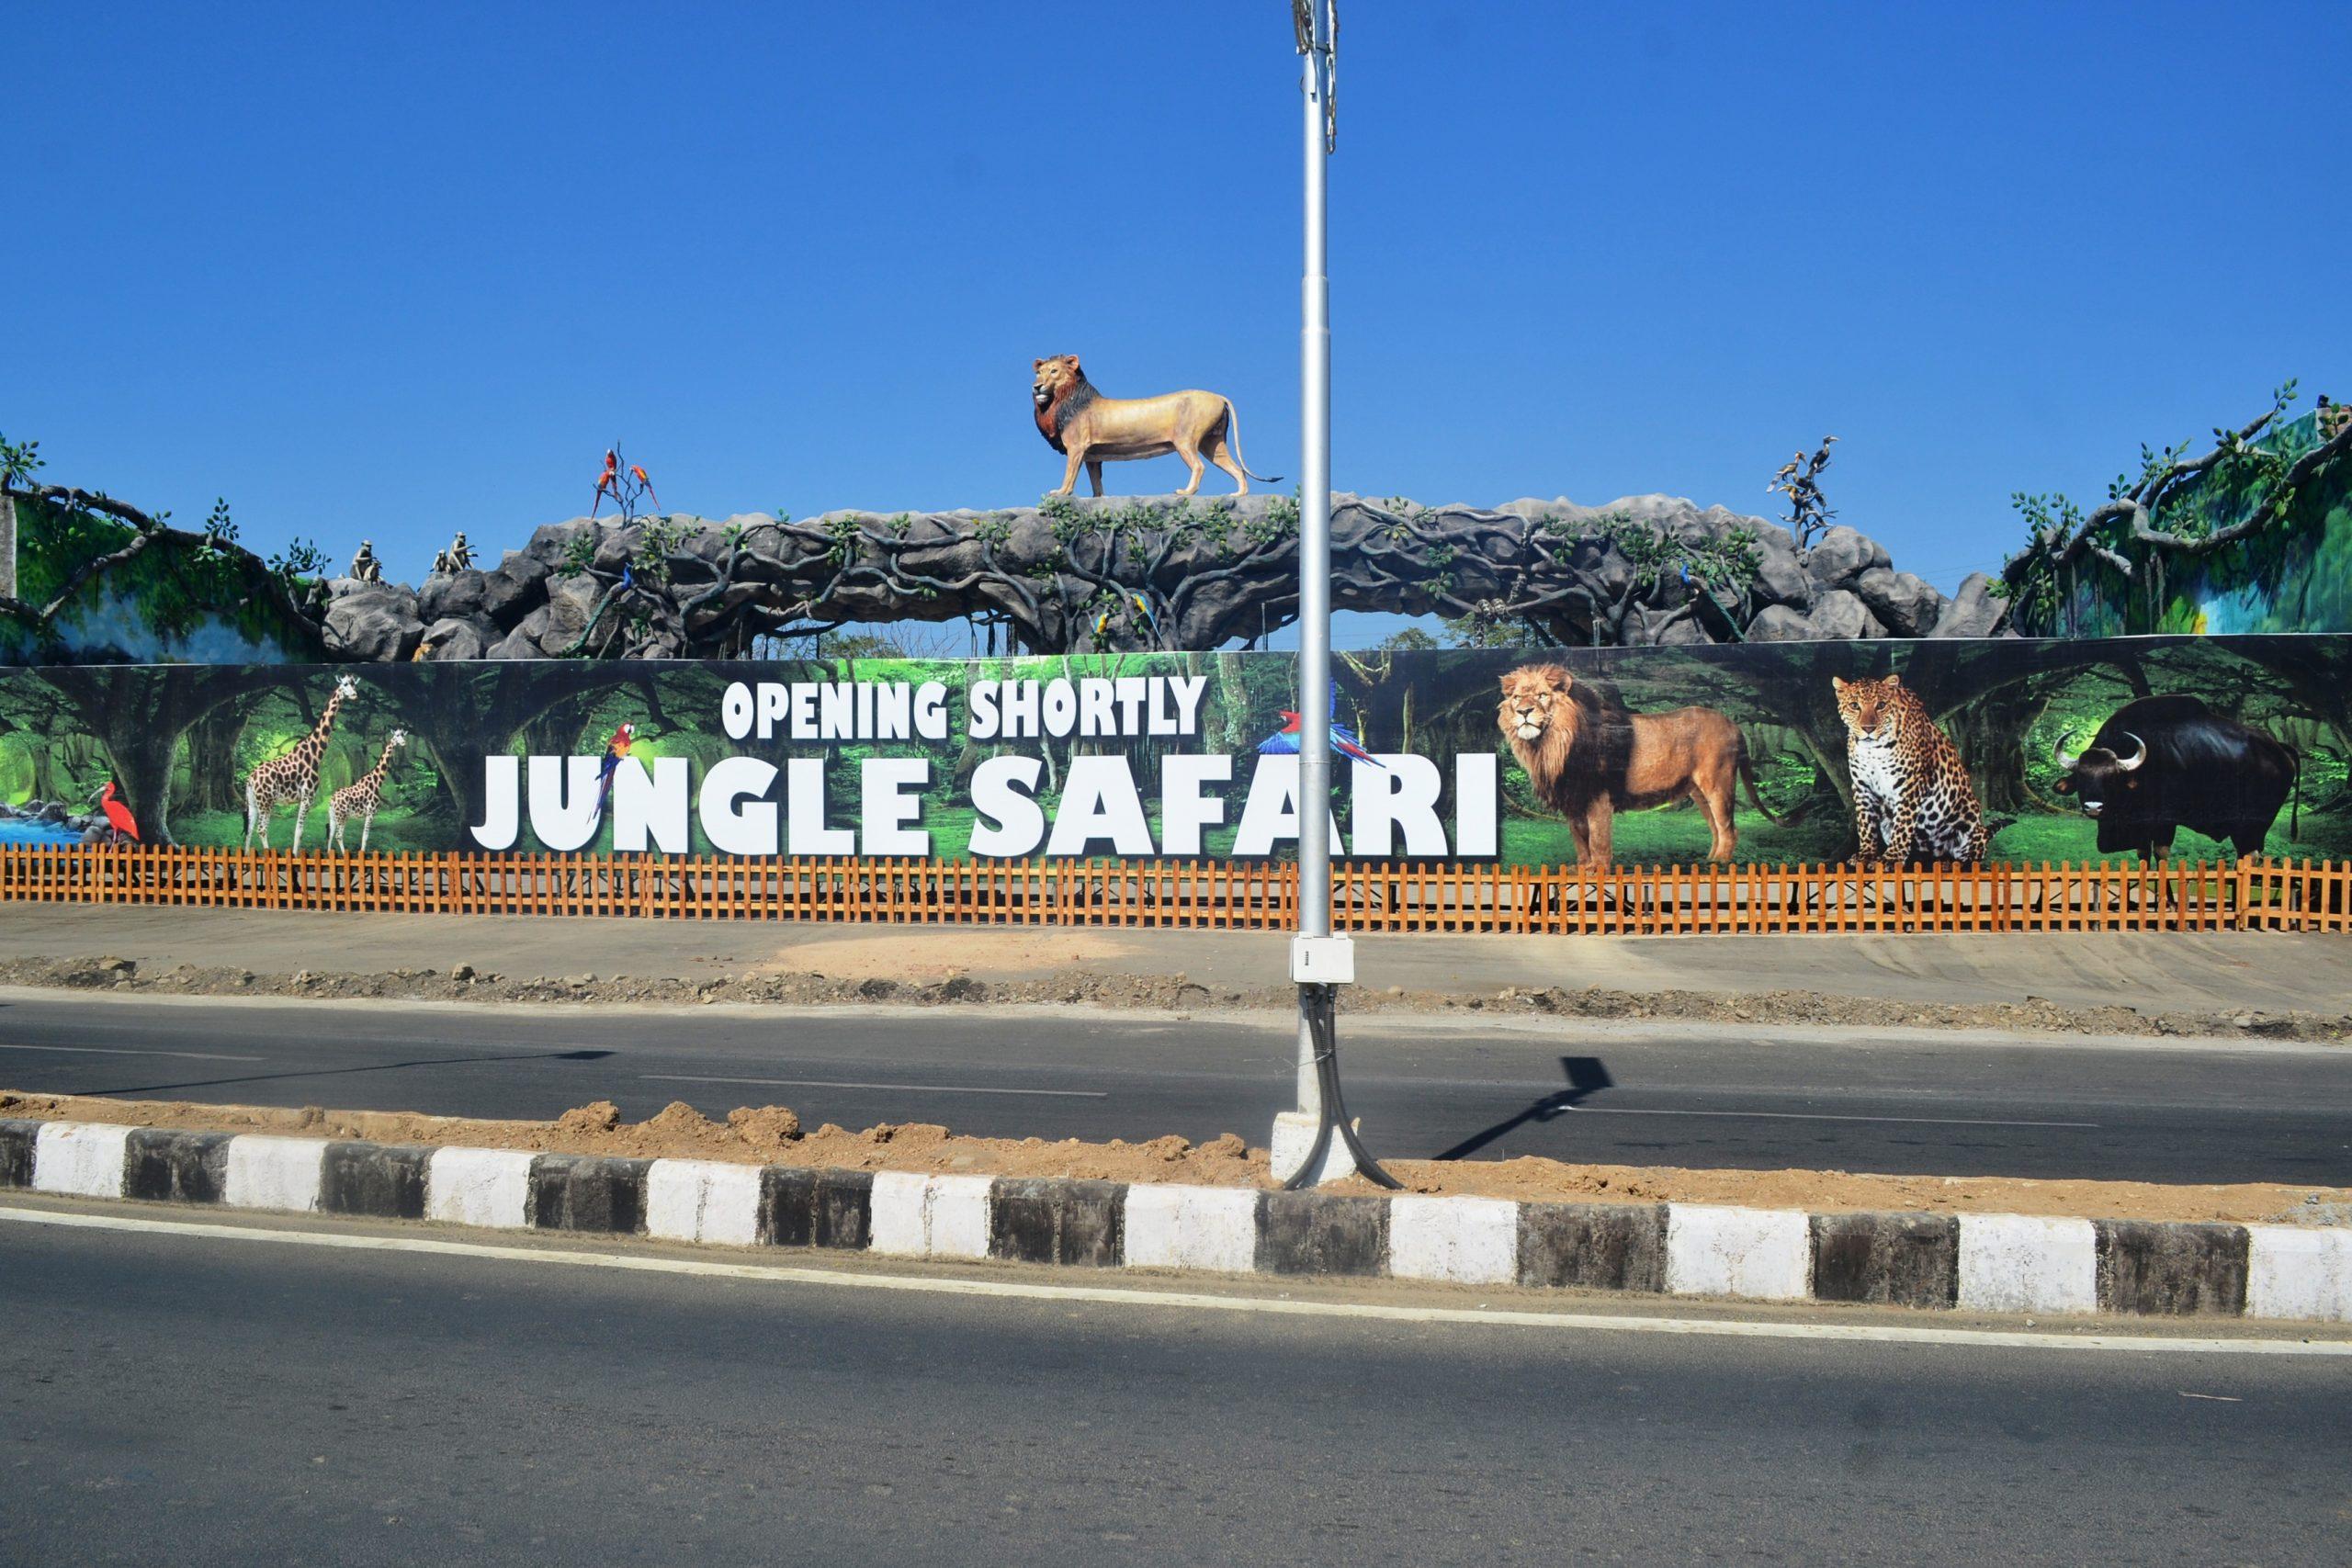 Signage board of a jungle safari